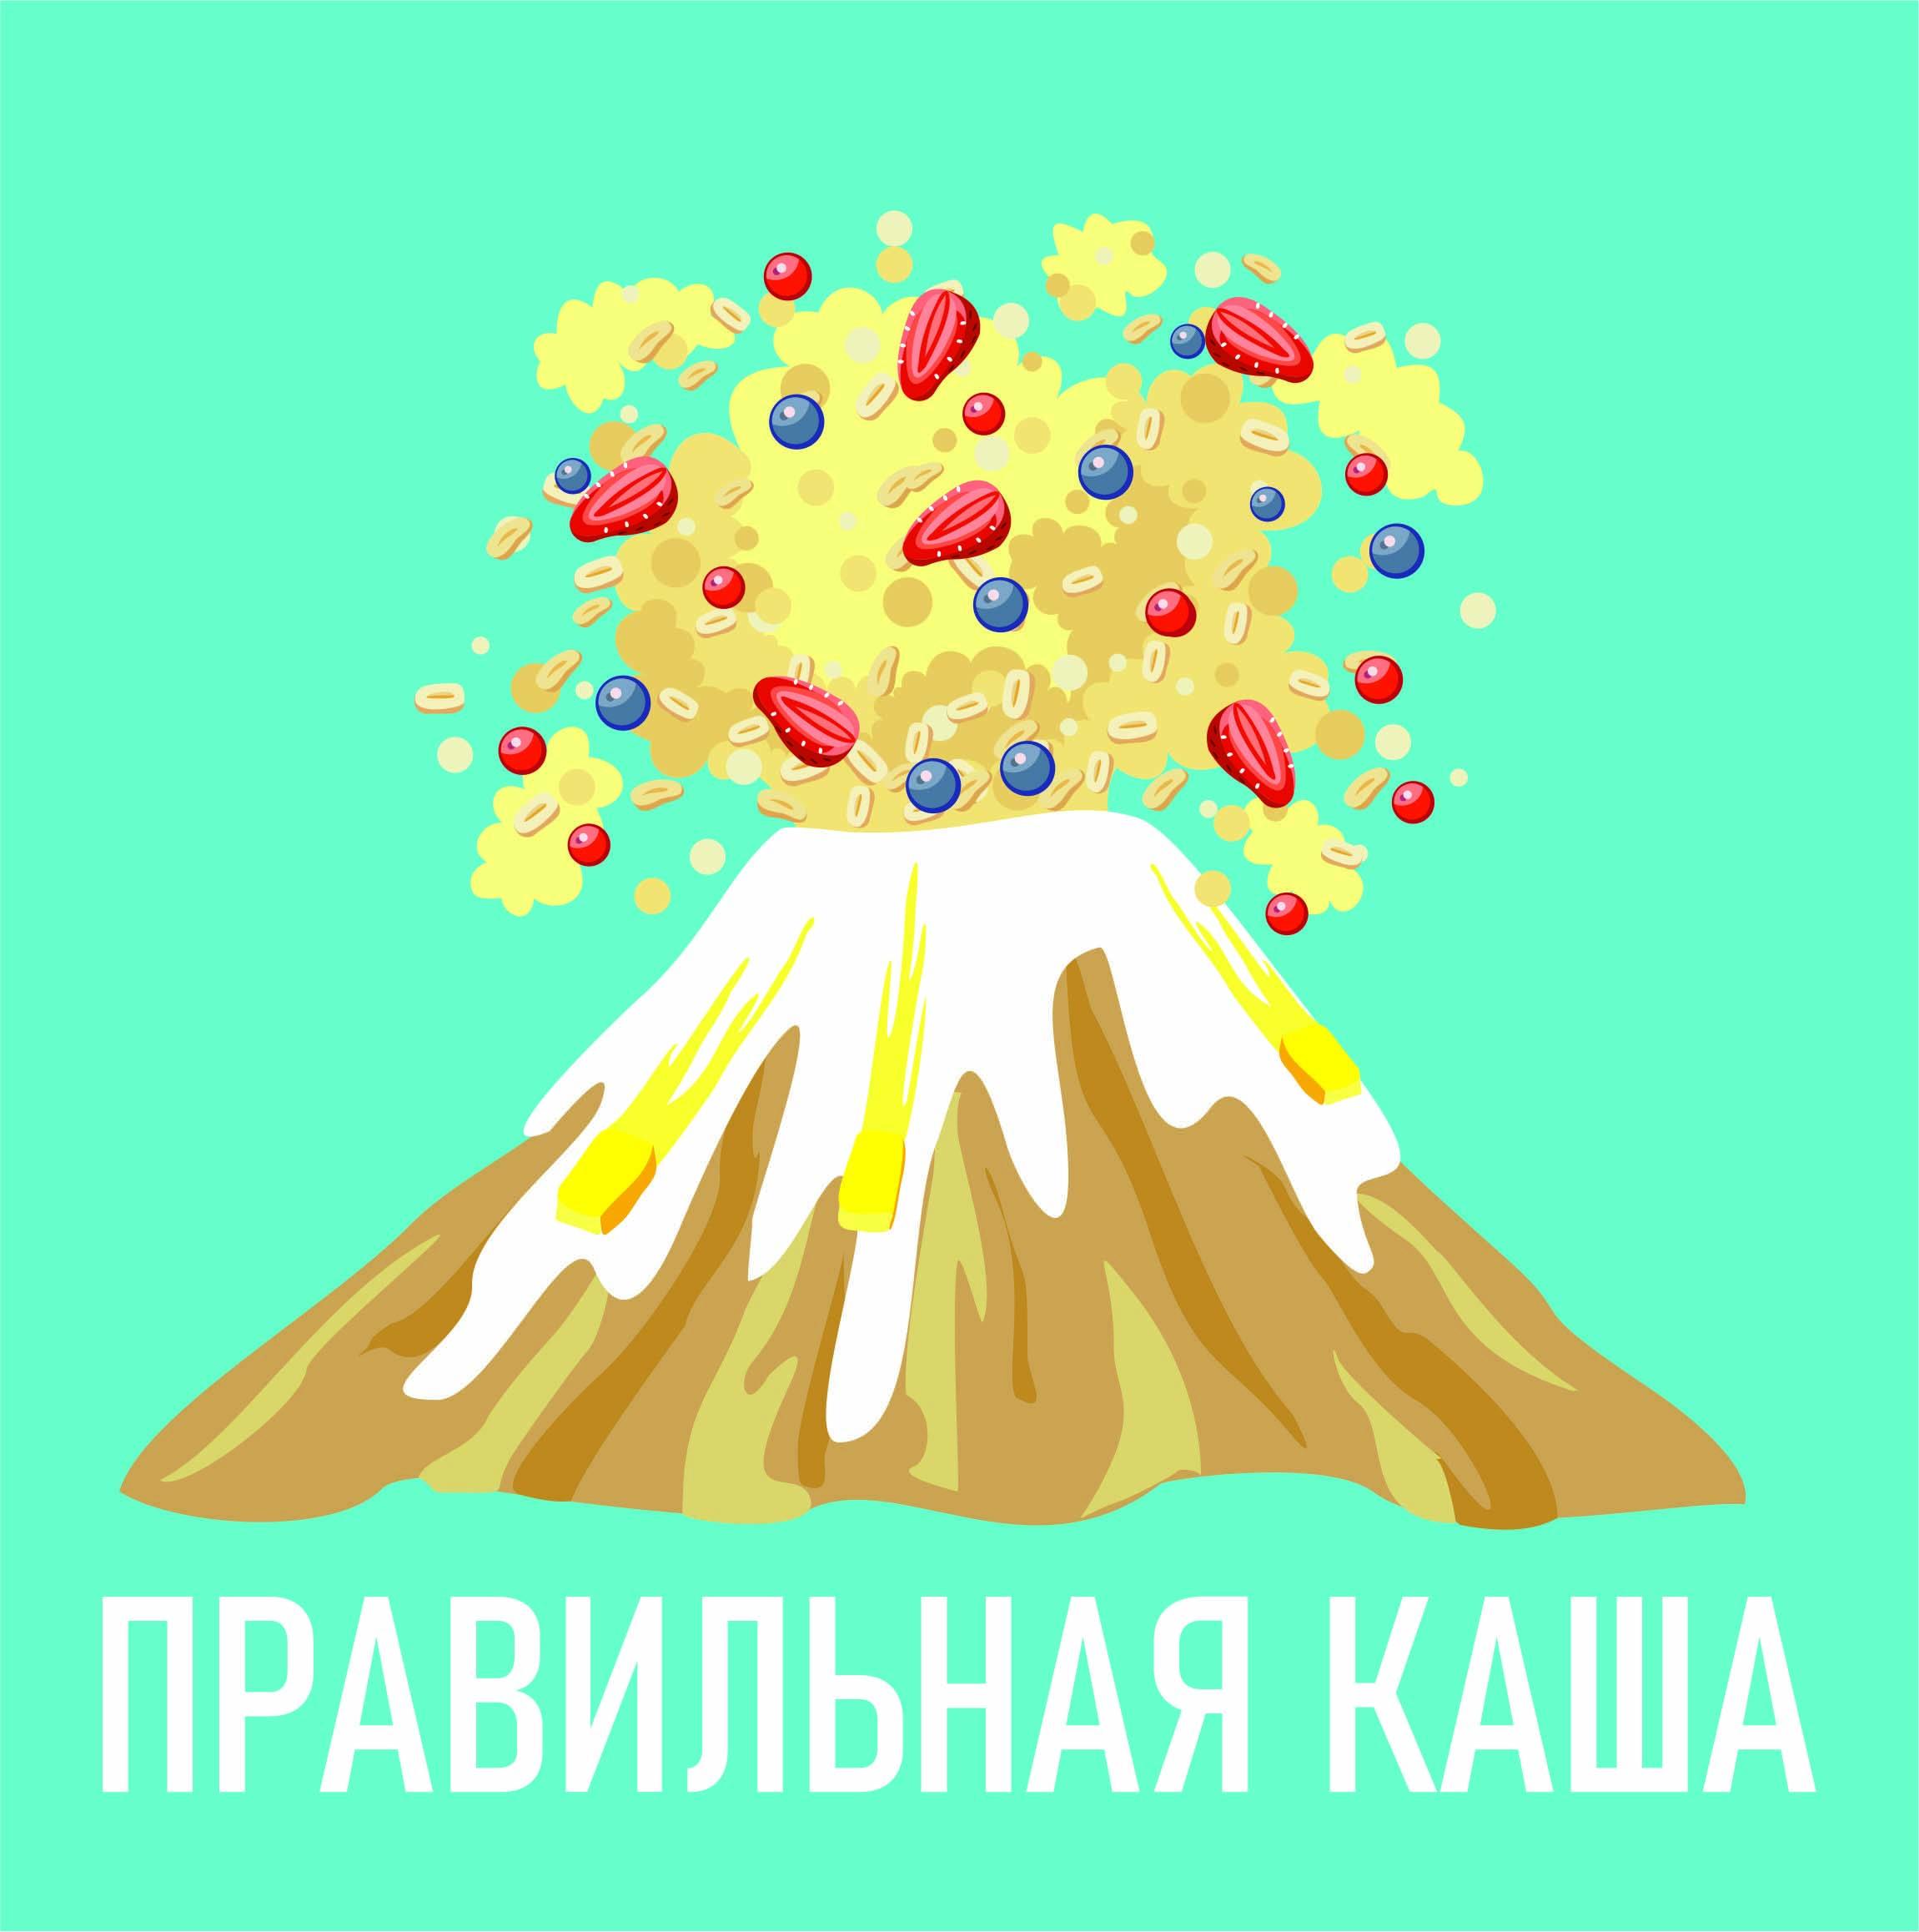 Веб-дизайнер, создание логотипа. фото f_2835ebd5f370d4d2.jpg